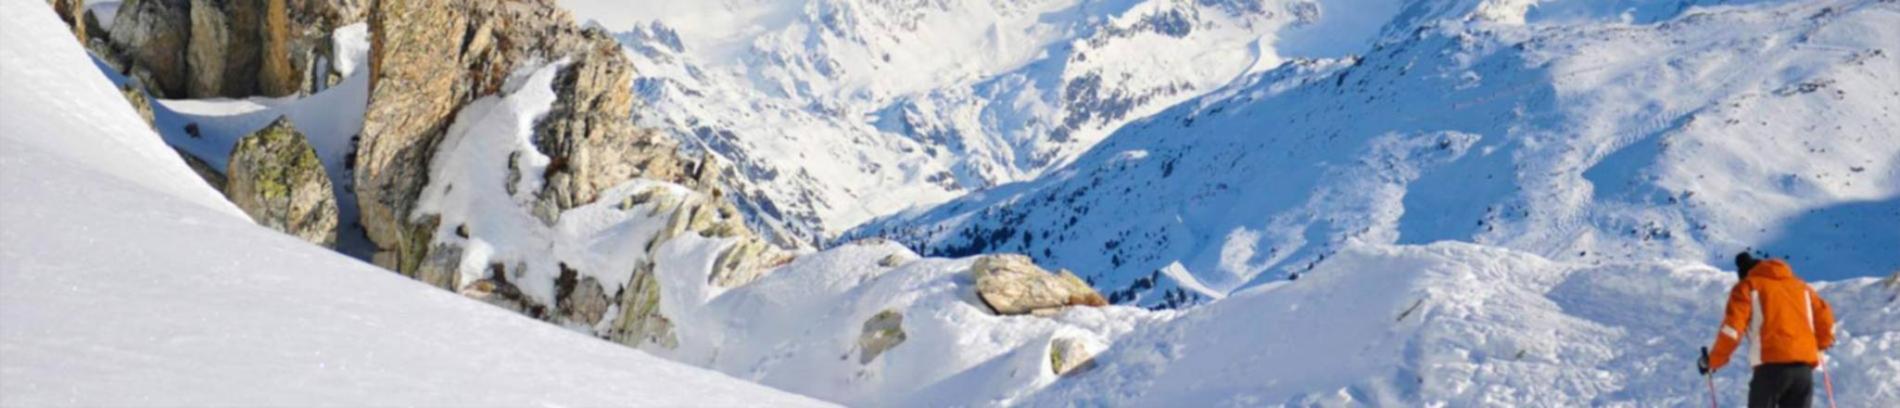 Slide ski